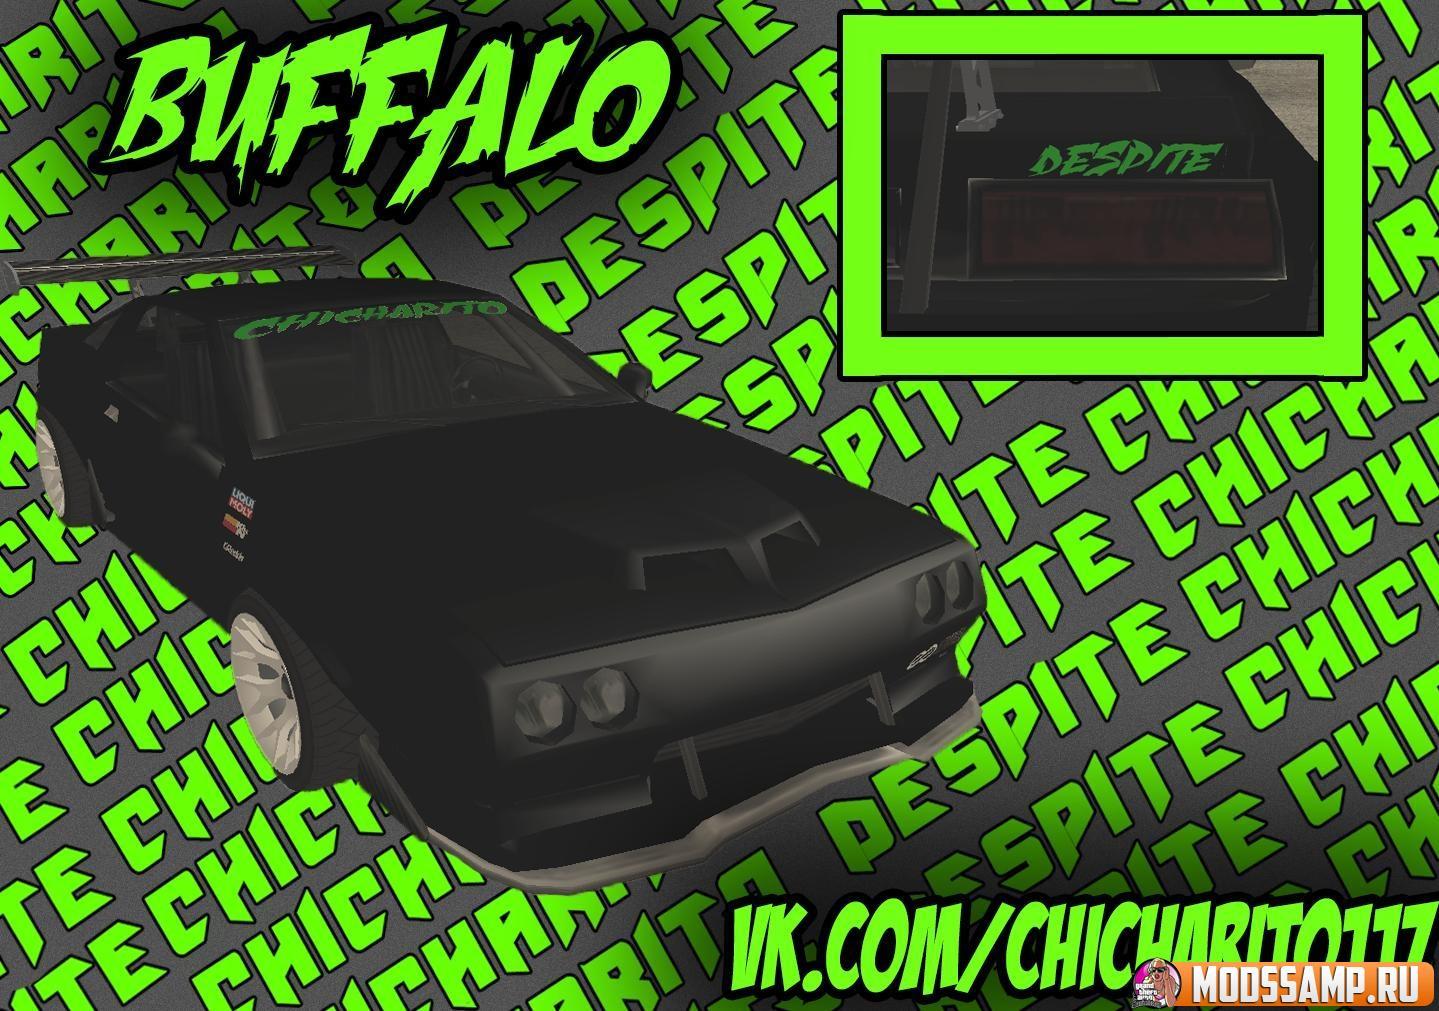 Buffalo от Chicharito Despite для GTA:SA